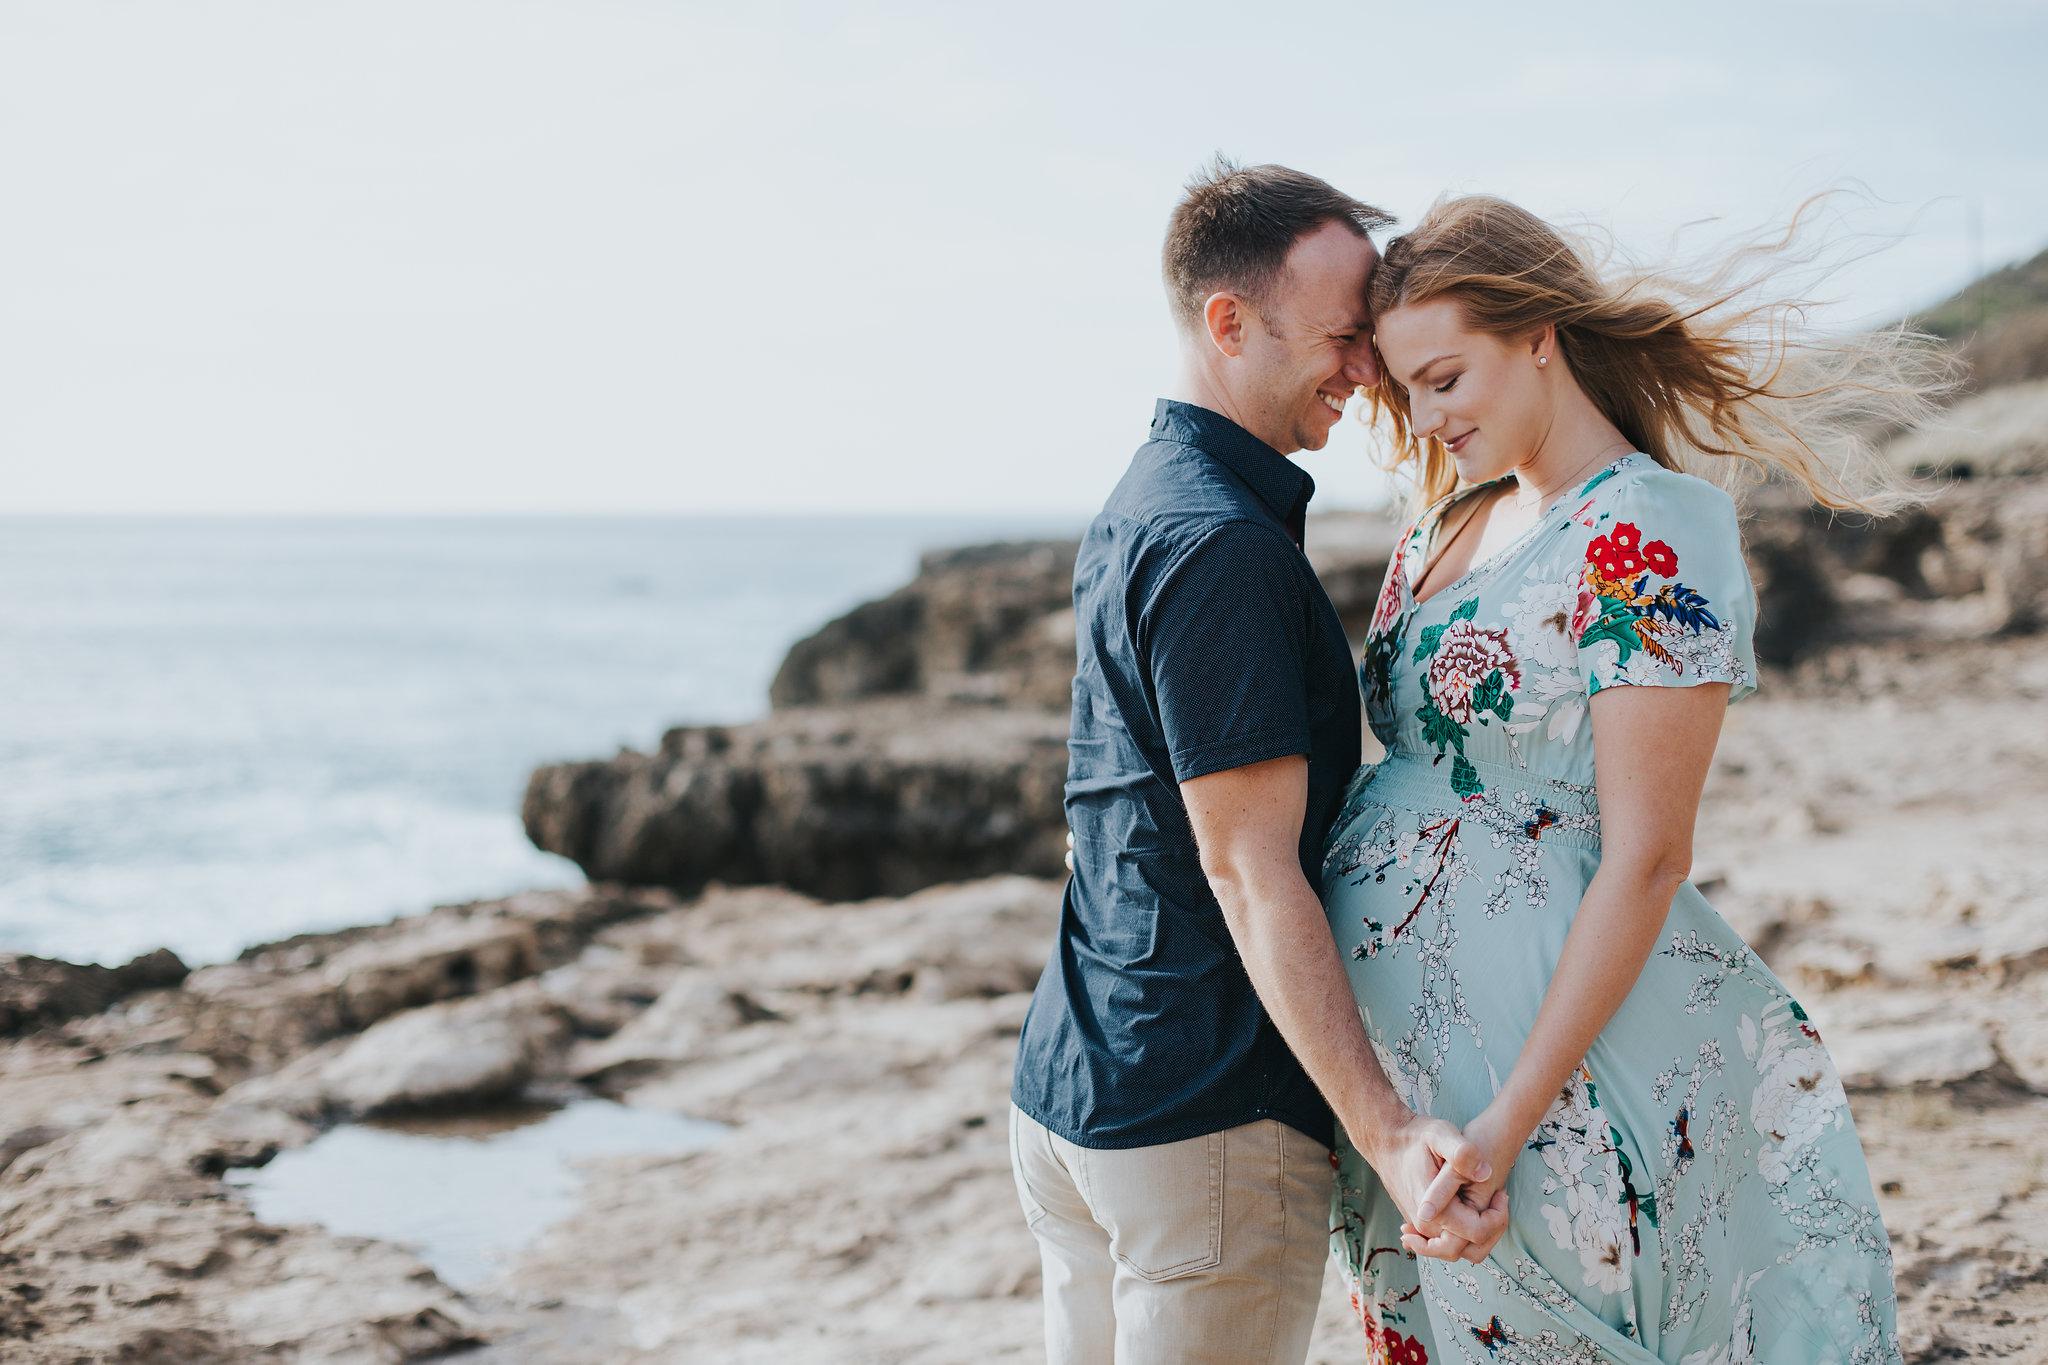 Oahu Hawaii | Maternity Photography Session